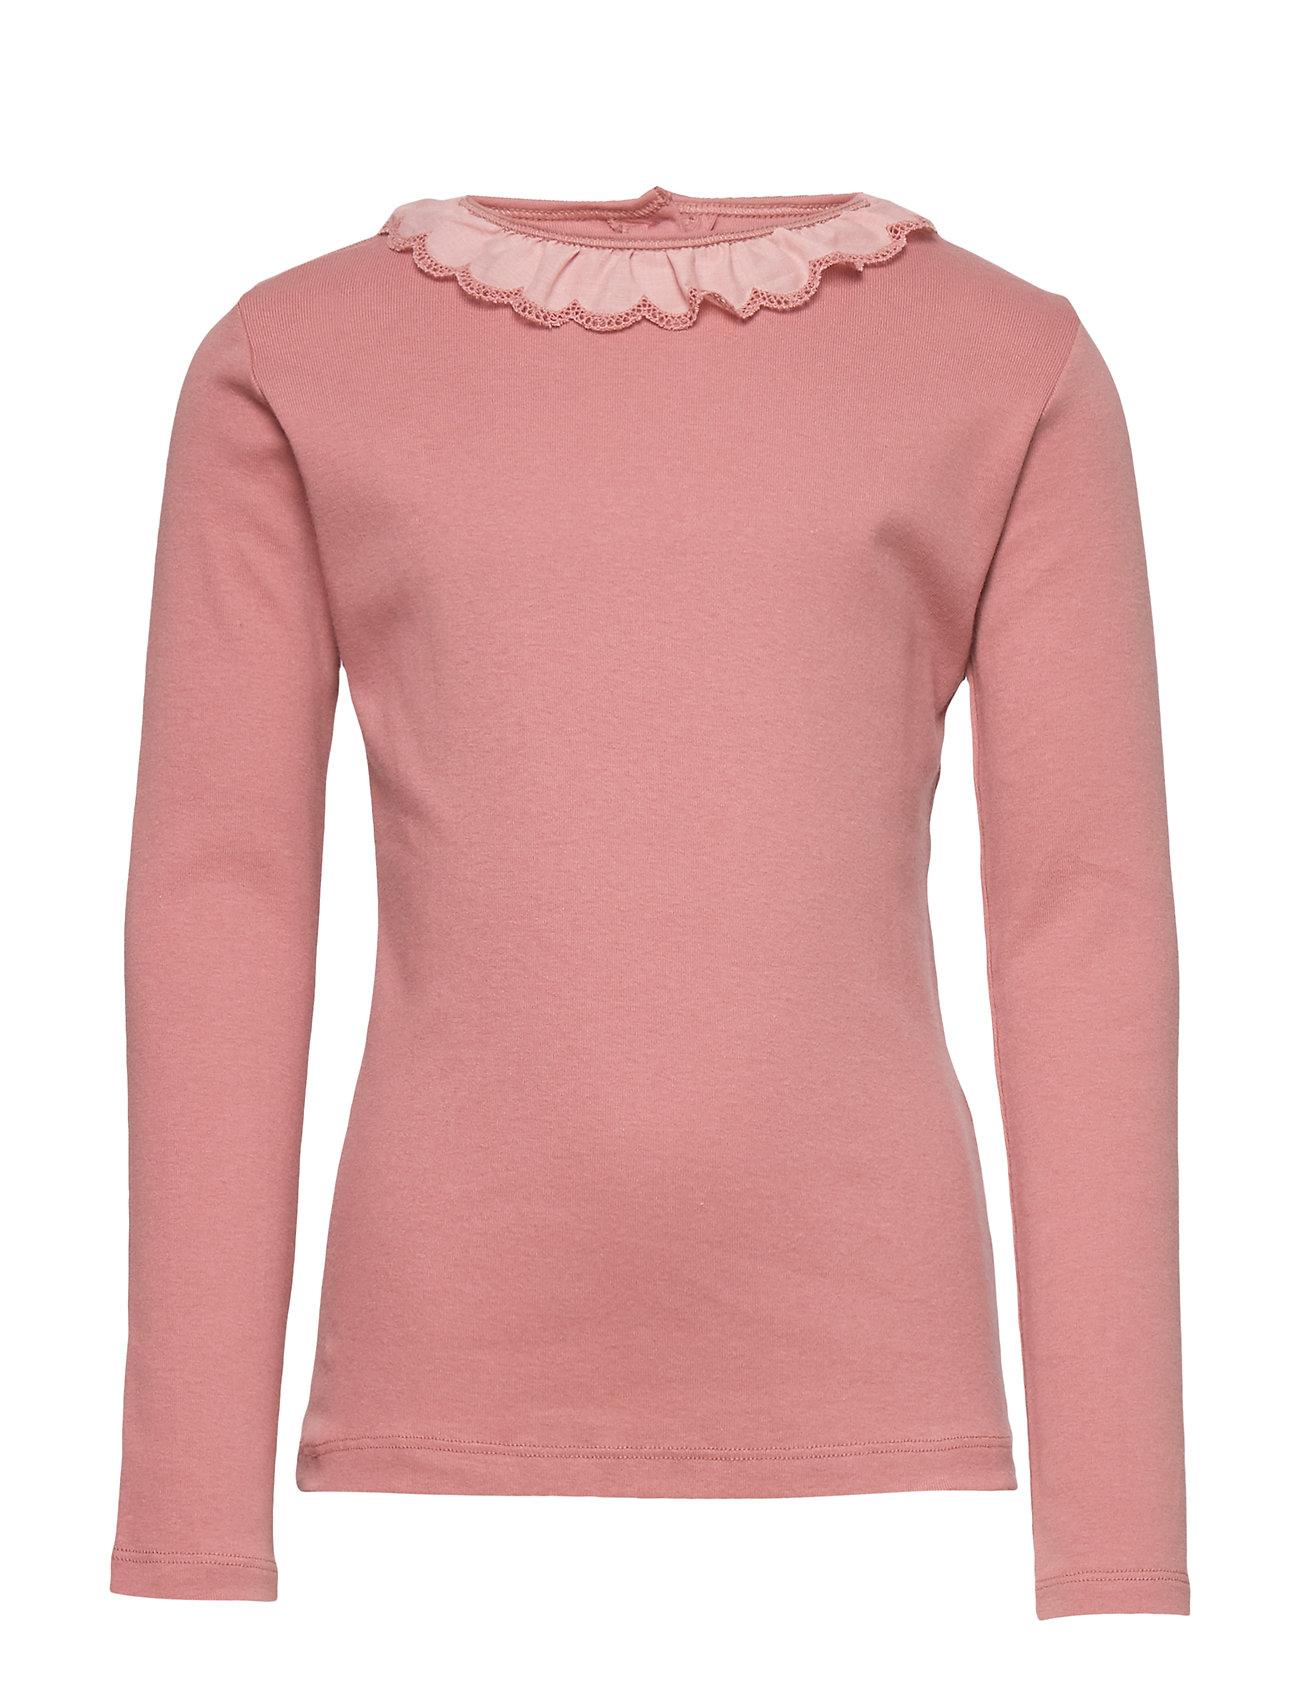 Noa Noa Miniature T-shirt - DUSTY ROSE